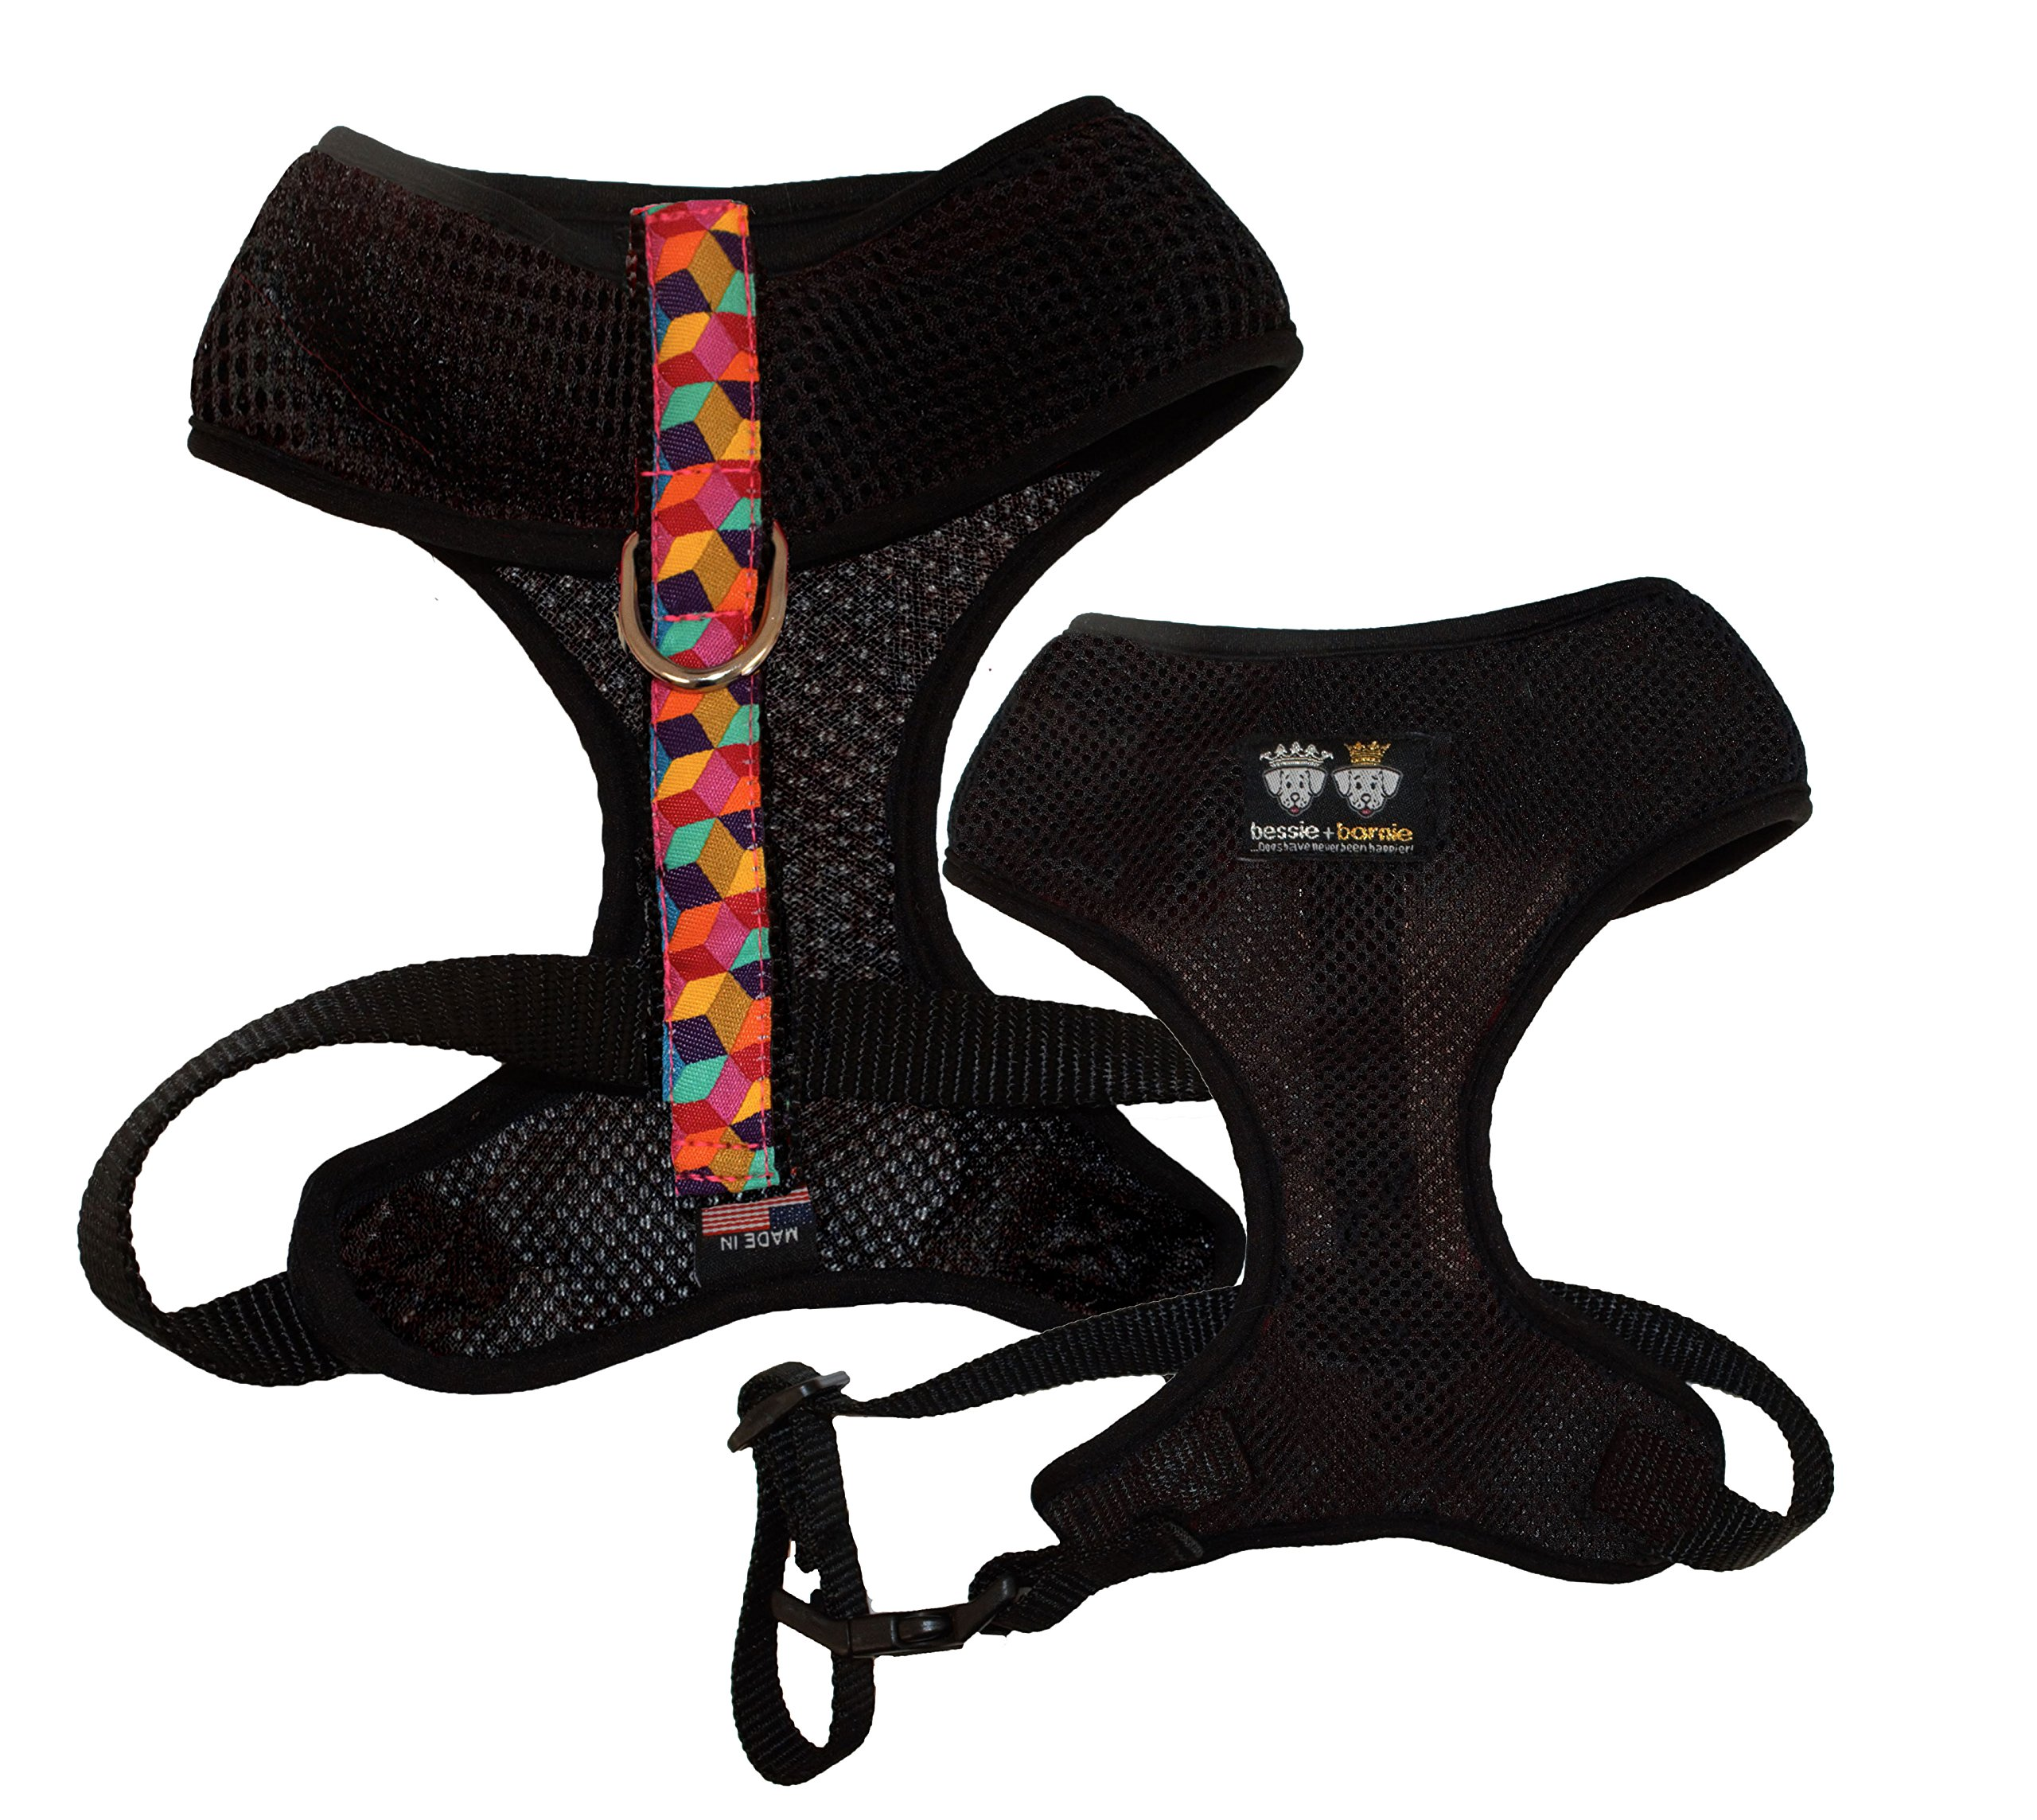 BESSIE AND BARNIE Signature Air Comfort Mesh Luxury Black/Rainbow Blocks/Black Pet Dog Durable Adjustable Harness (Multiple Sizes) by BESSIE AND BARNIE